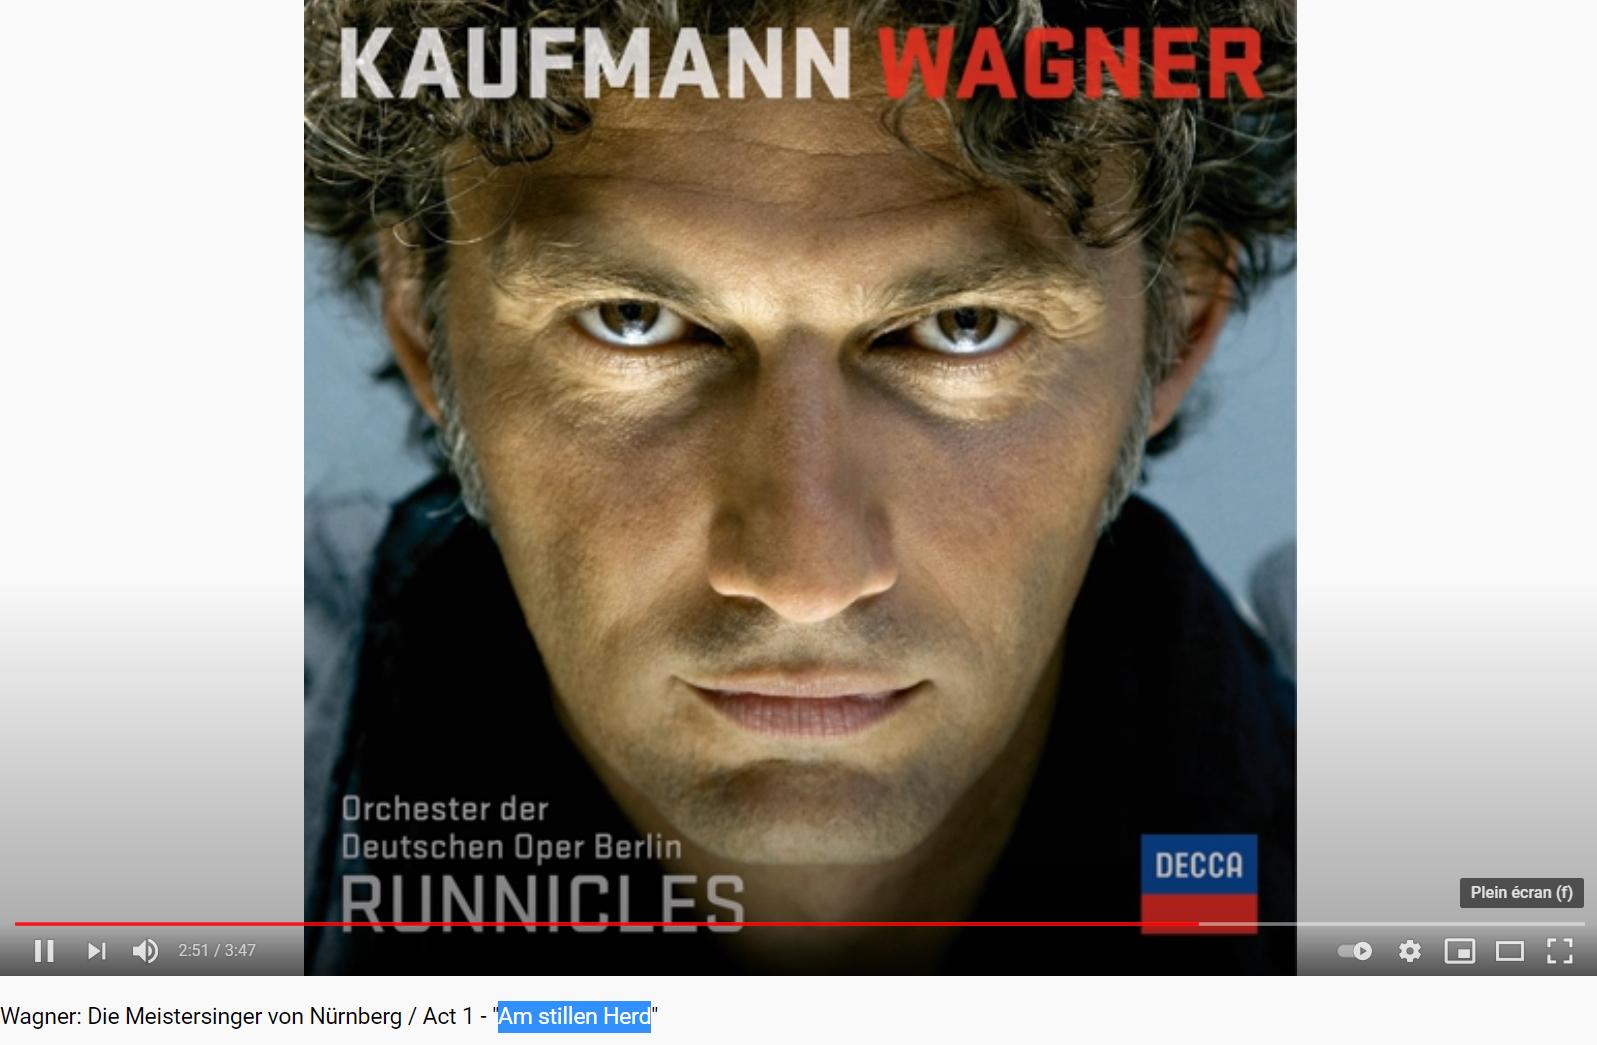 Wagner les Maîtres-chanteurs Am stillen Herd (Walter acte I)